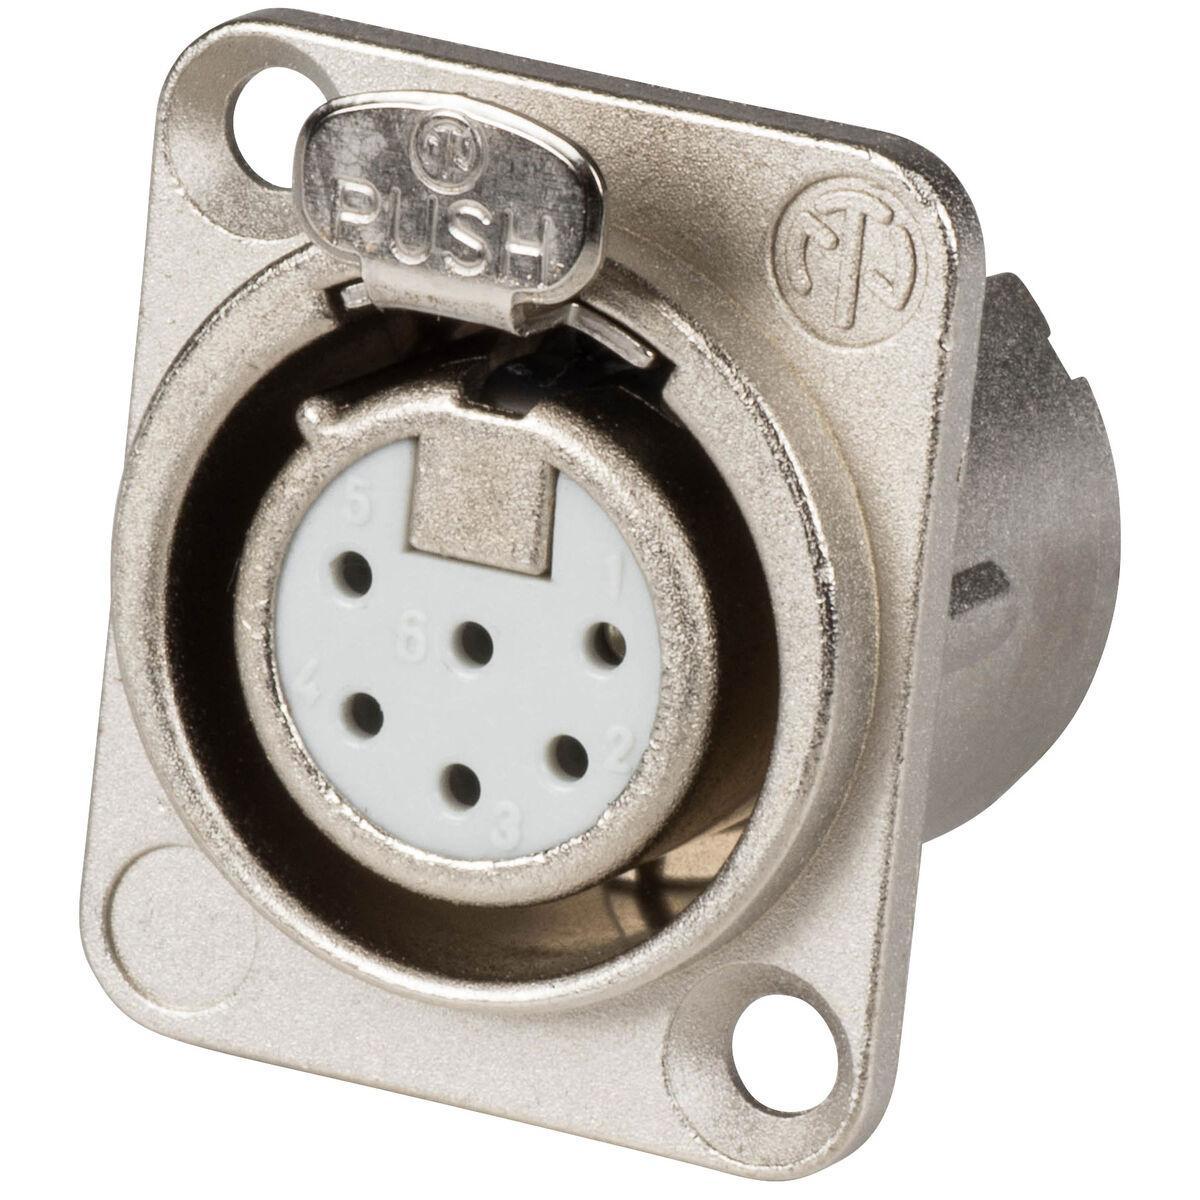 NEUTRIK NC6FRC 6 Pin XLR Cable Mount f Right Angle